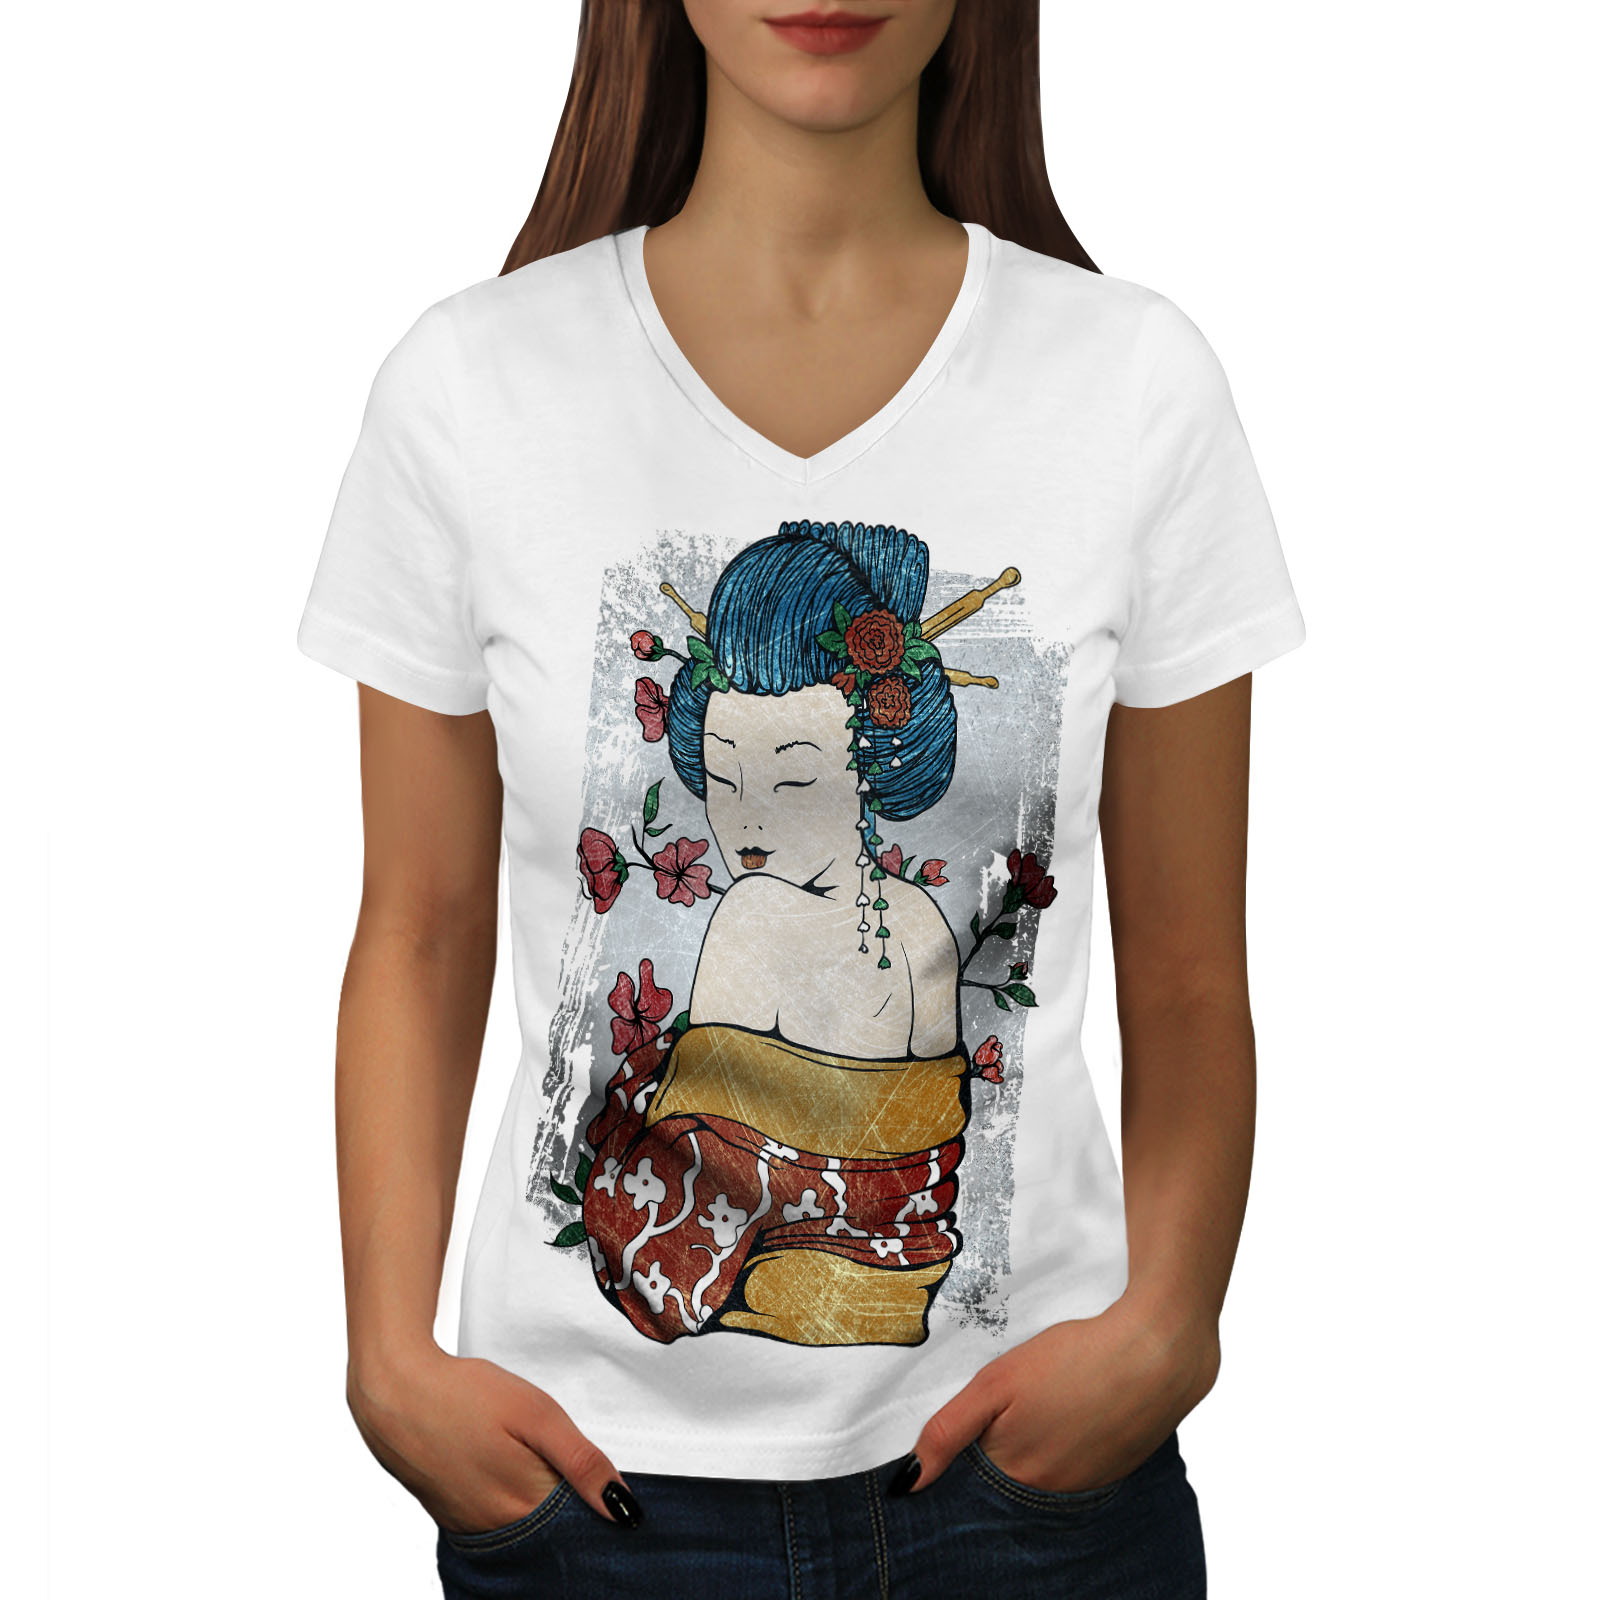 Wellcoda-Japan-Woman-Beauty-Womens-V-Neck-T-shirt-Oriental-Graphic-Design-Tee thumbnail 7